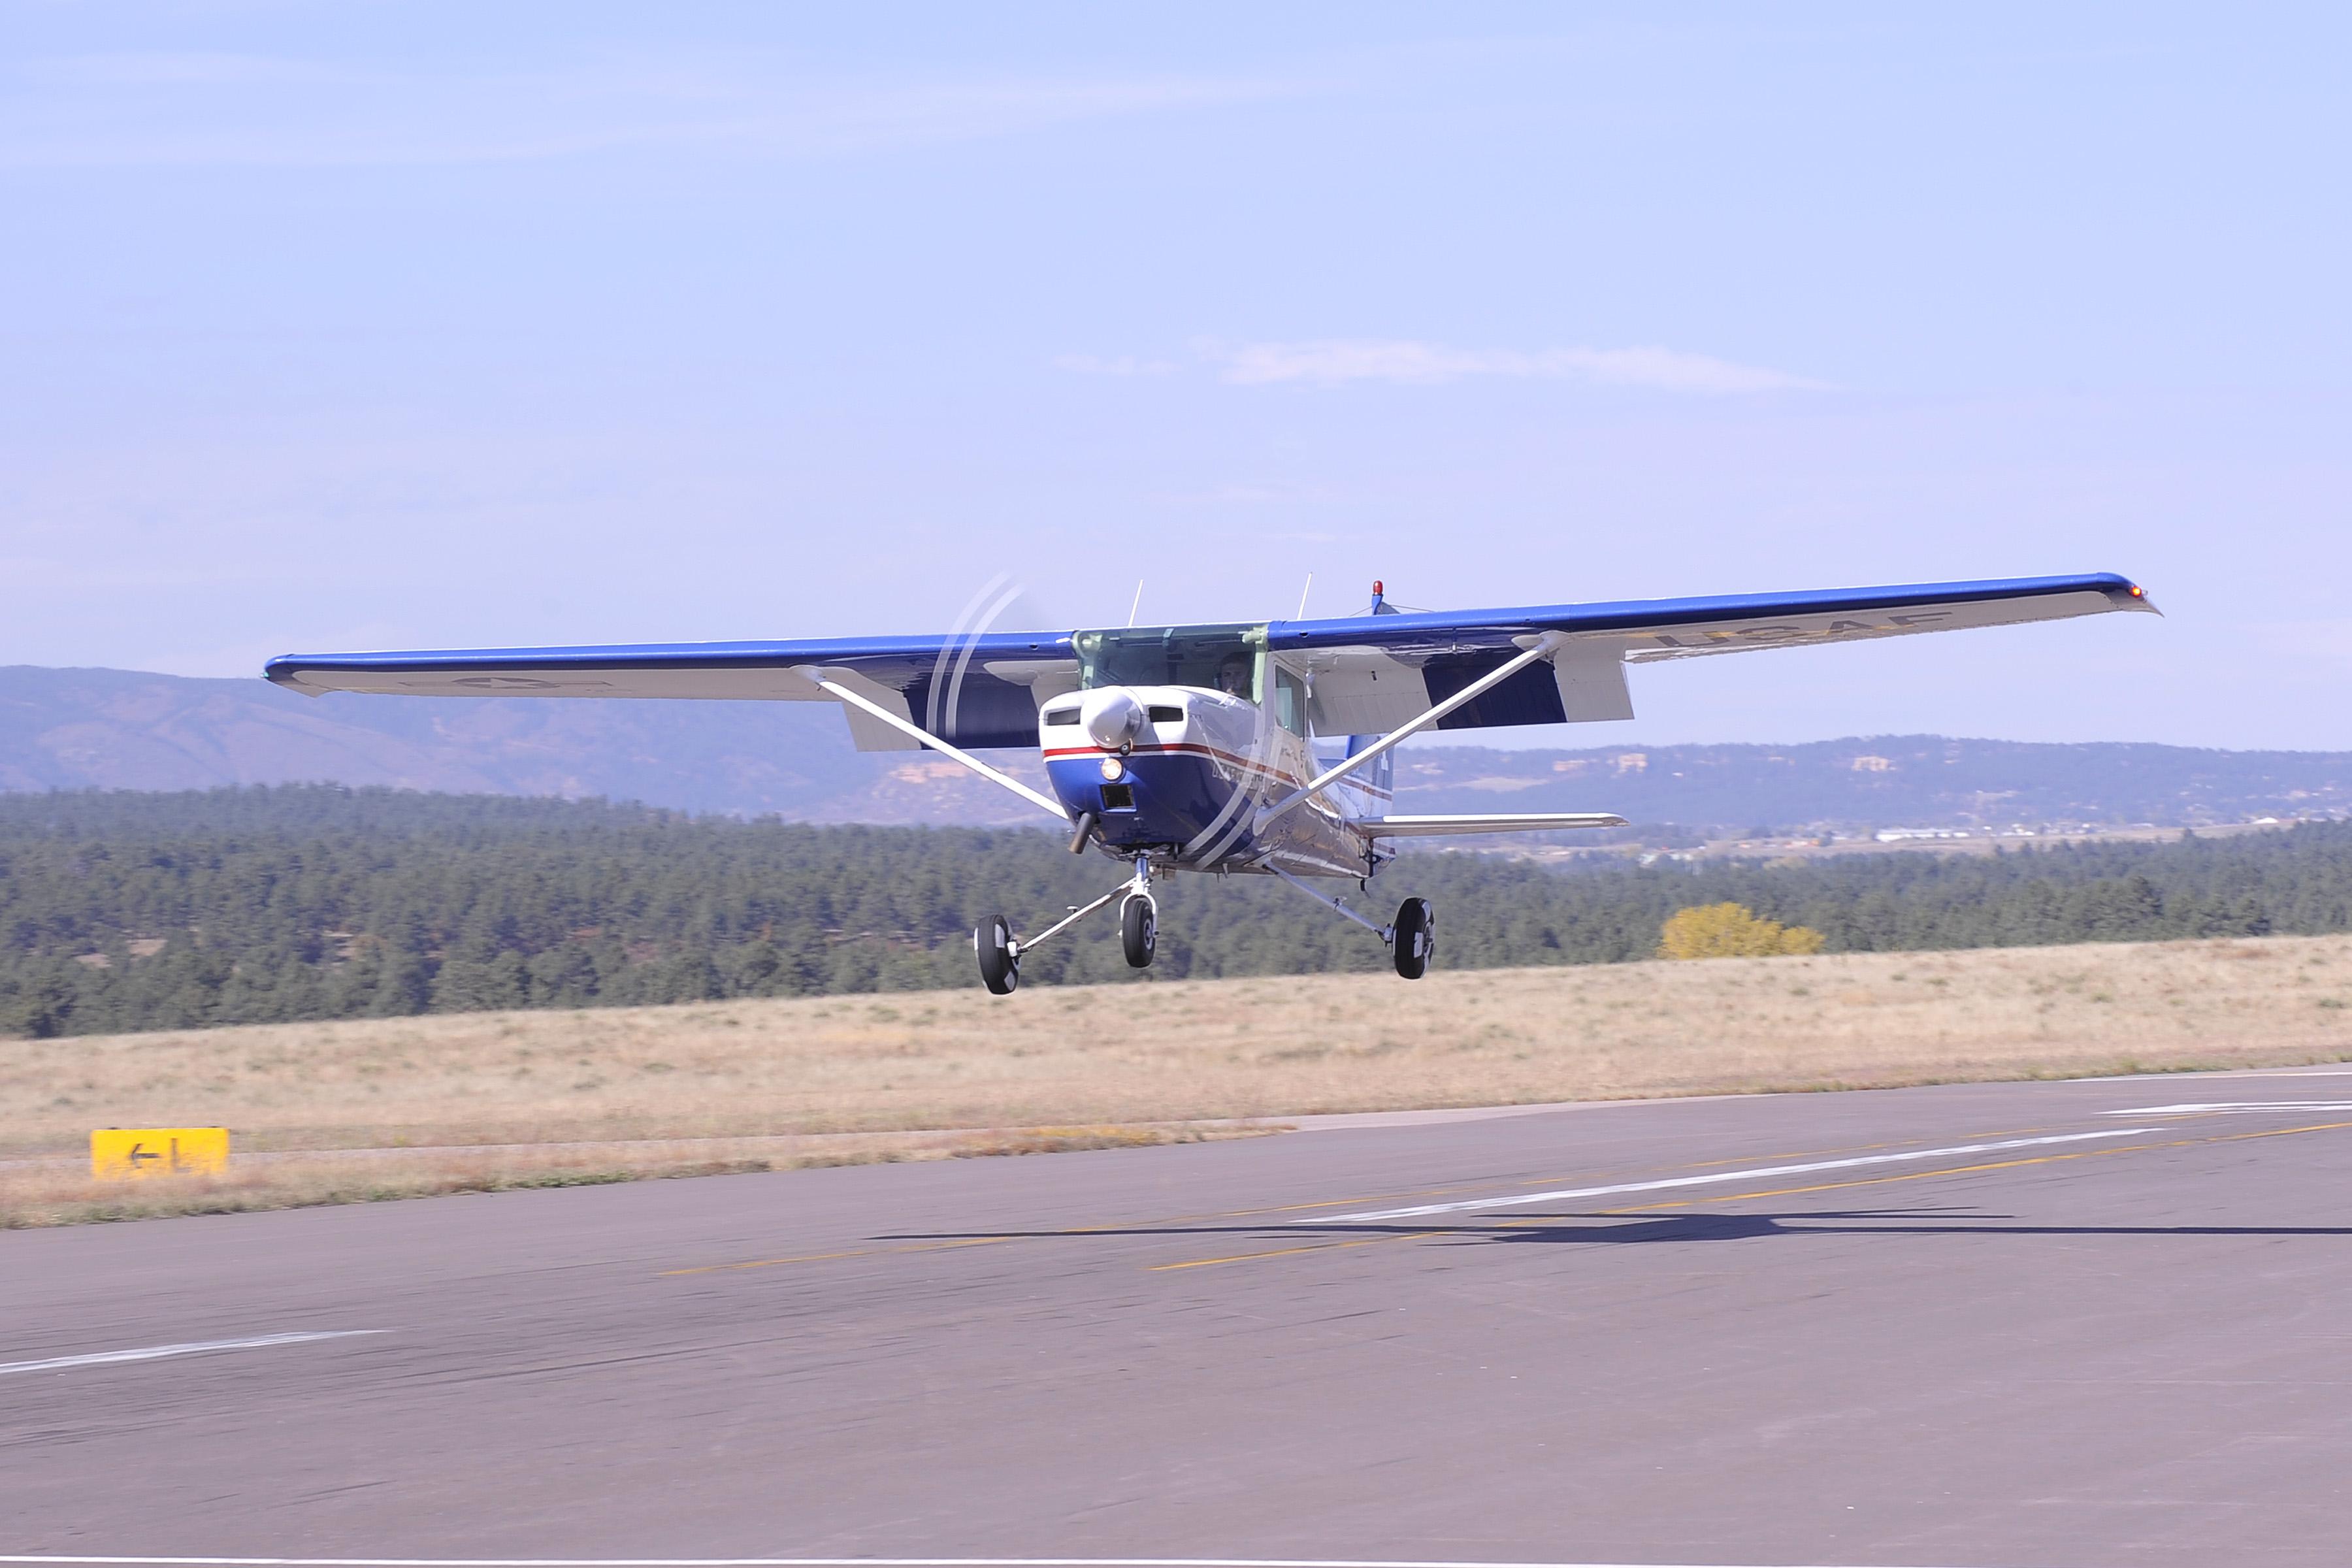 A Cessna 172 lands safely!